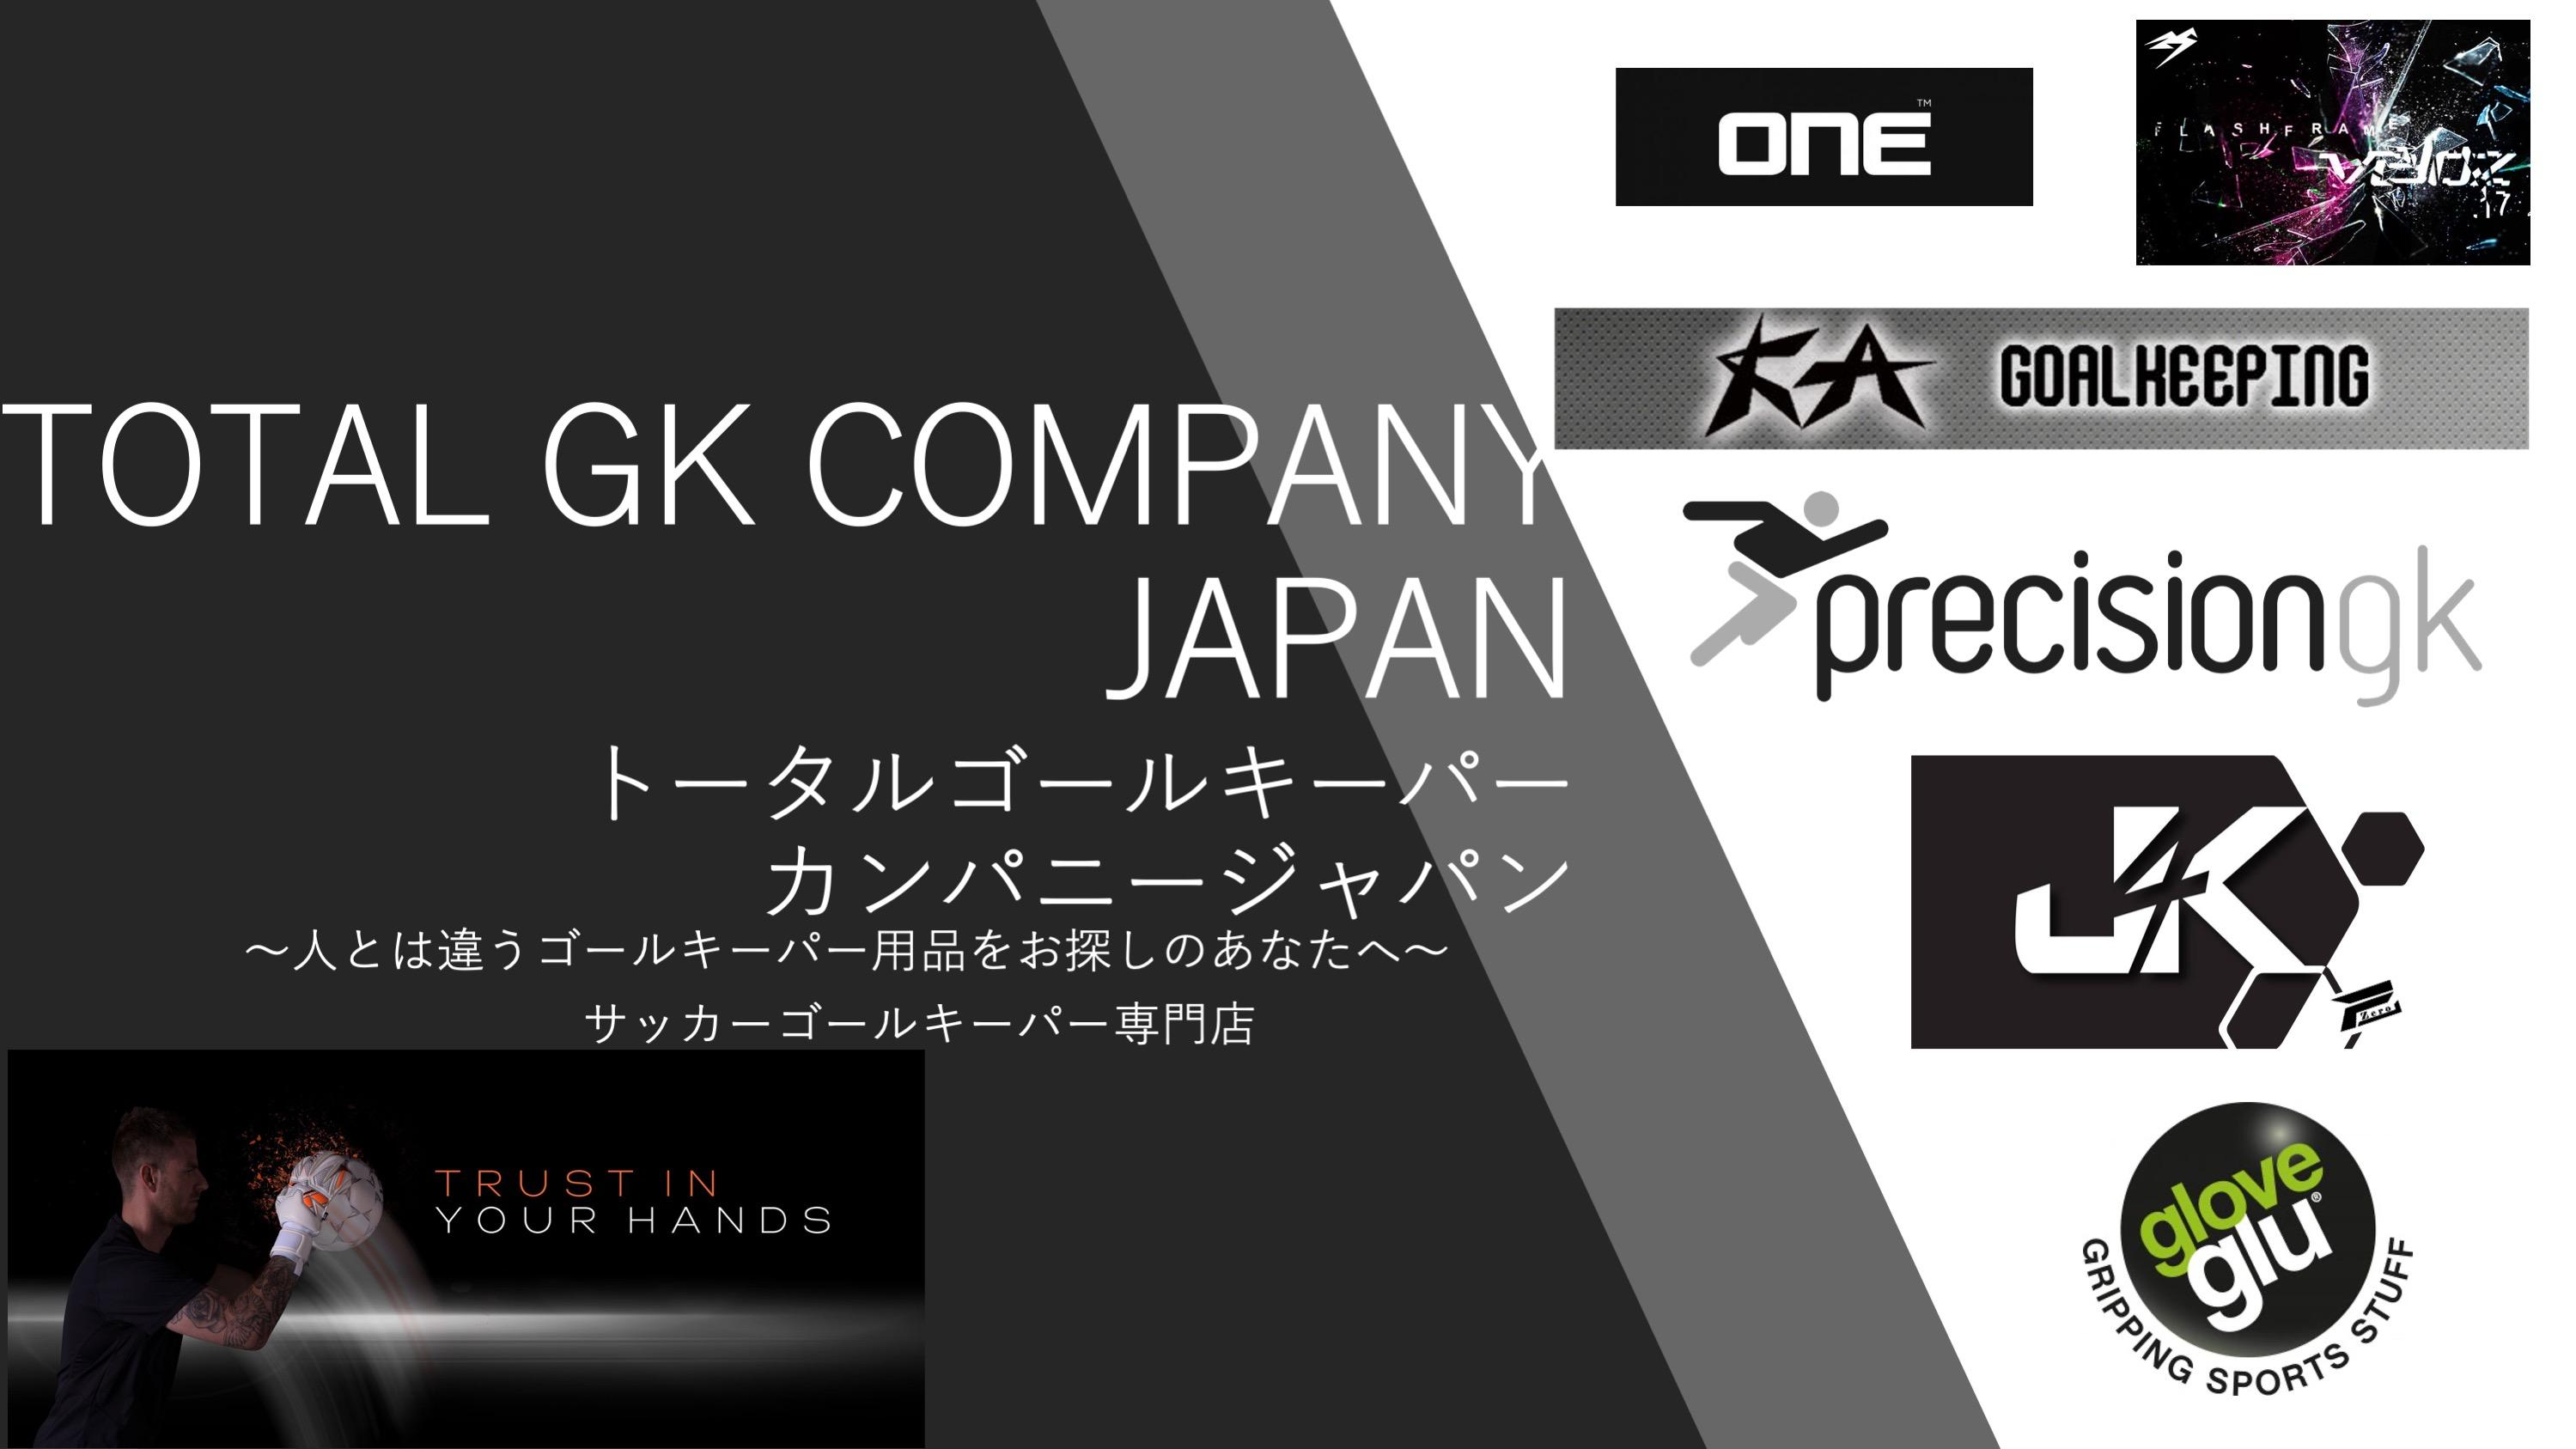 Total Goalkeeper Company JAPAN